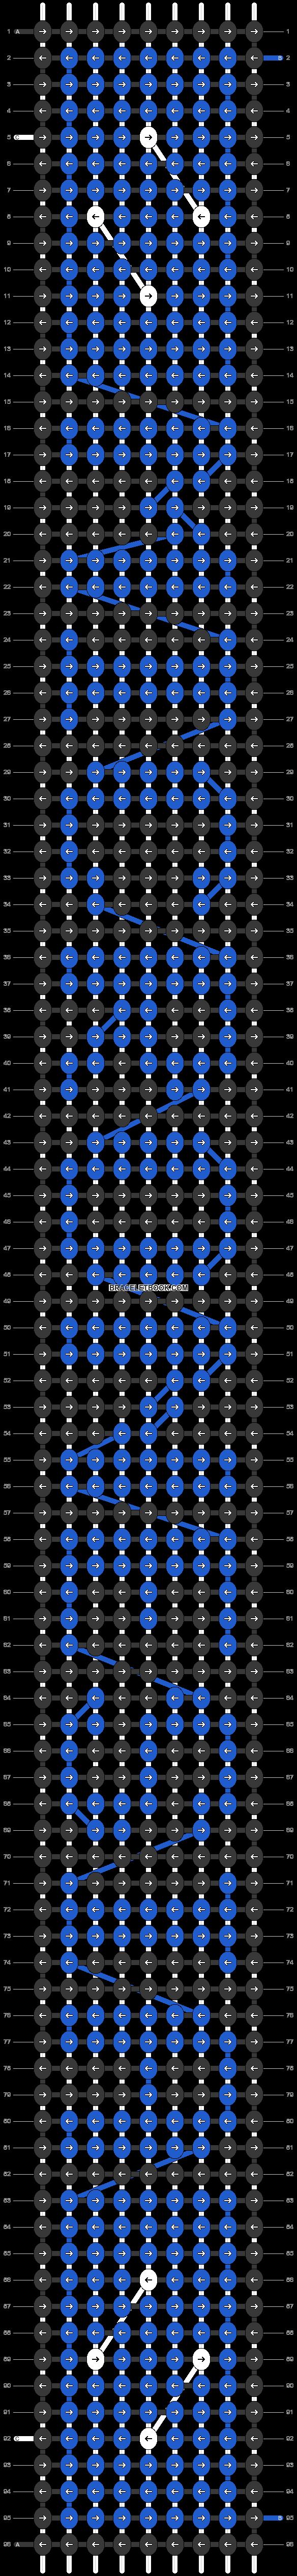 Alpha pattern #37502 pattern